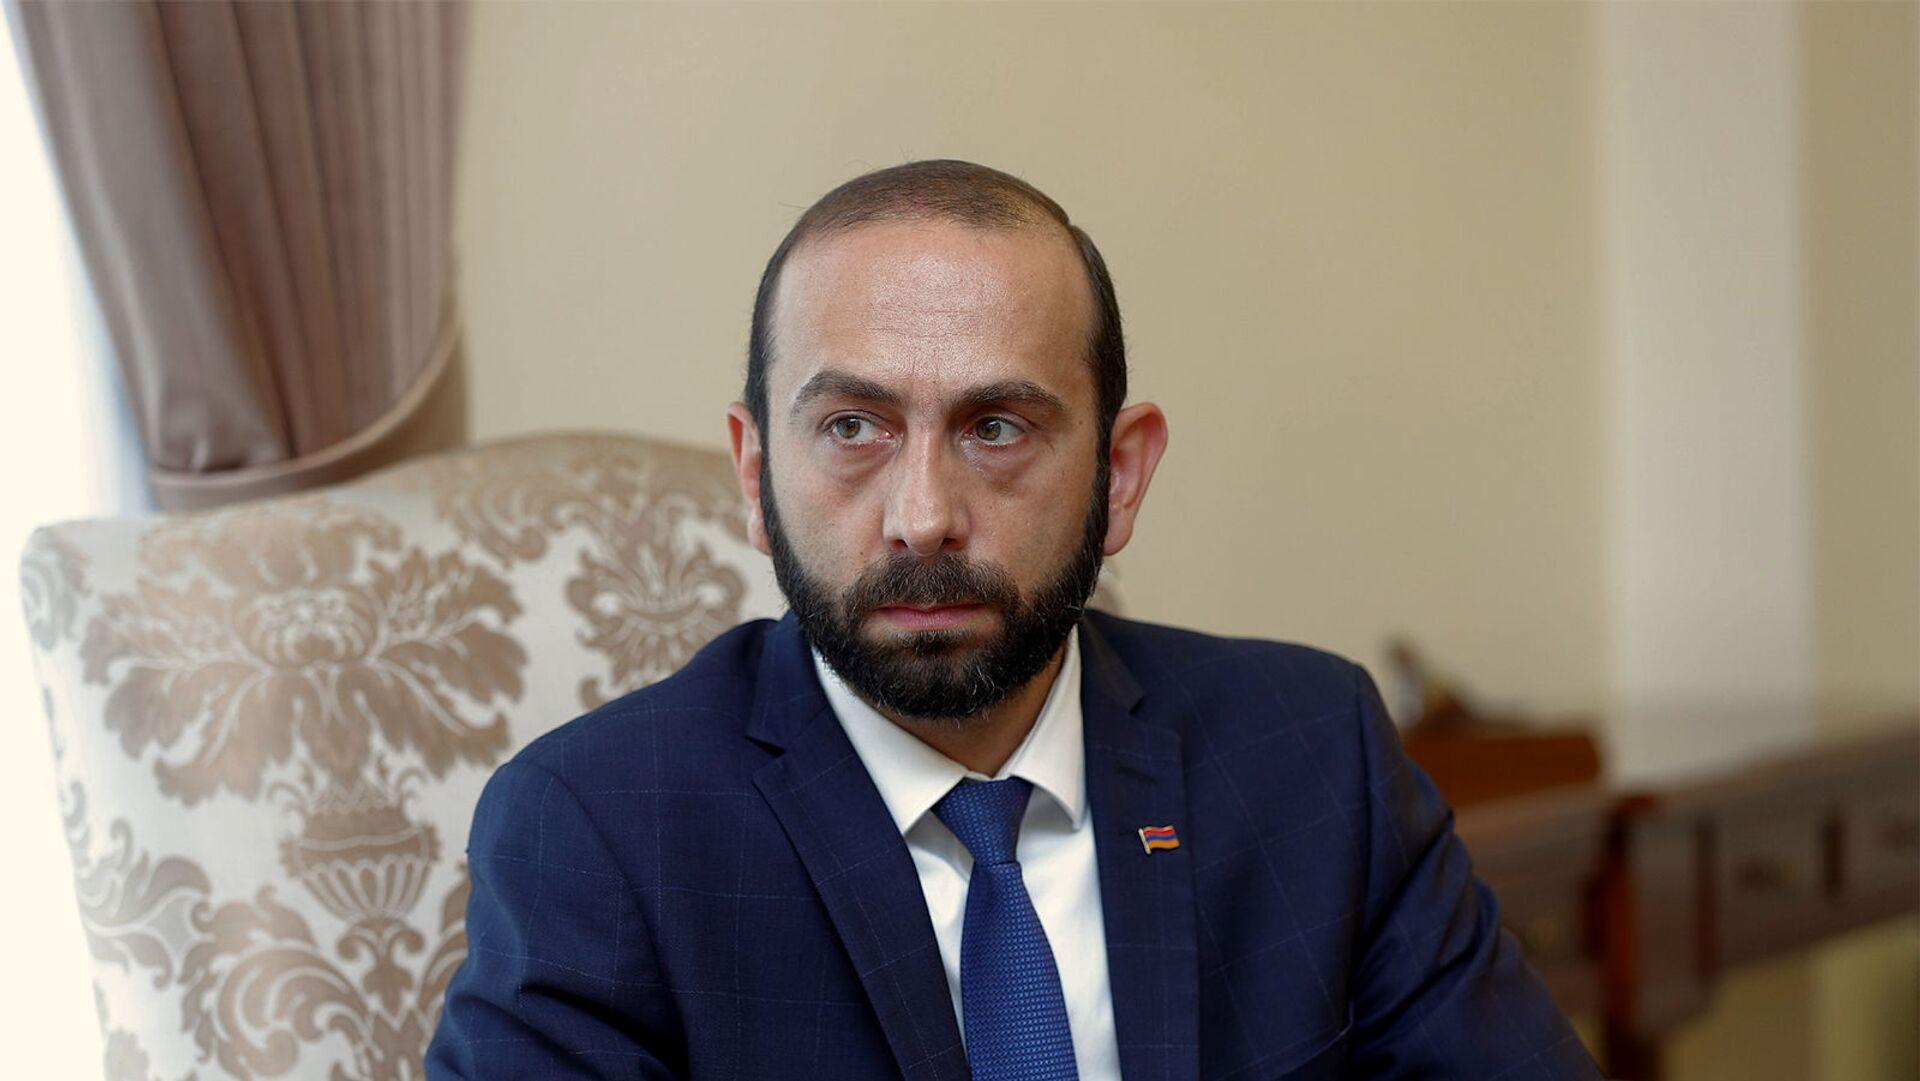 Министр иностранных дел Арарат Мирзоян - Sputnik Արմենիա, 1920, 26.08.2021